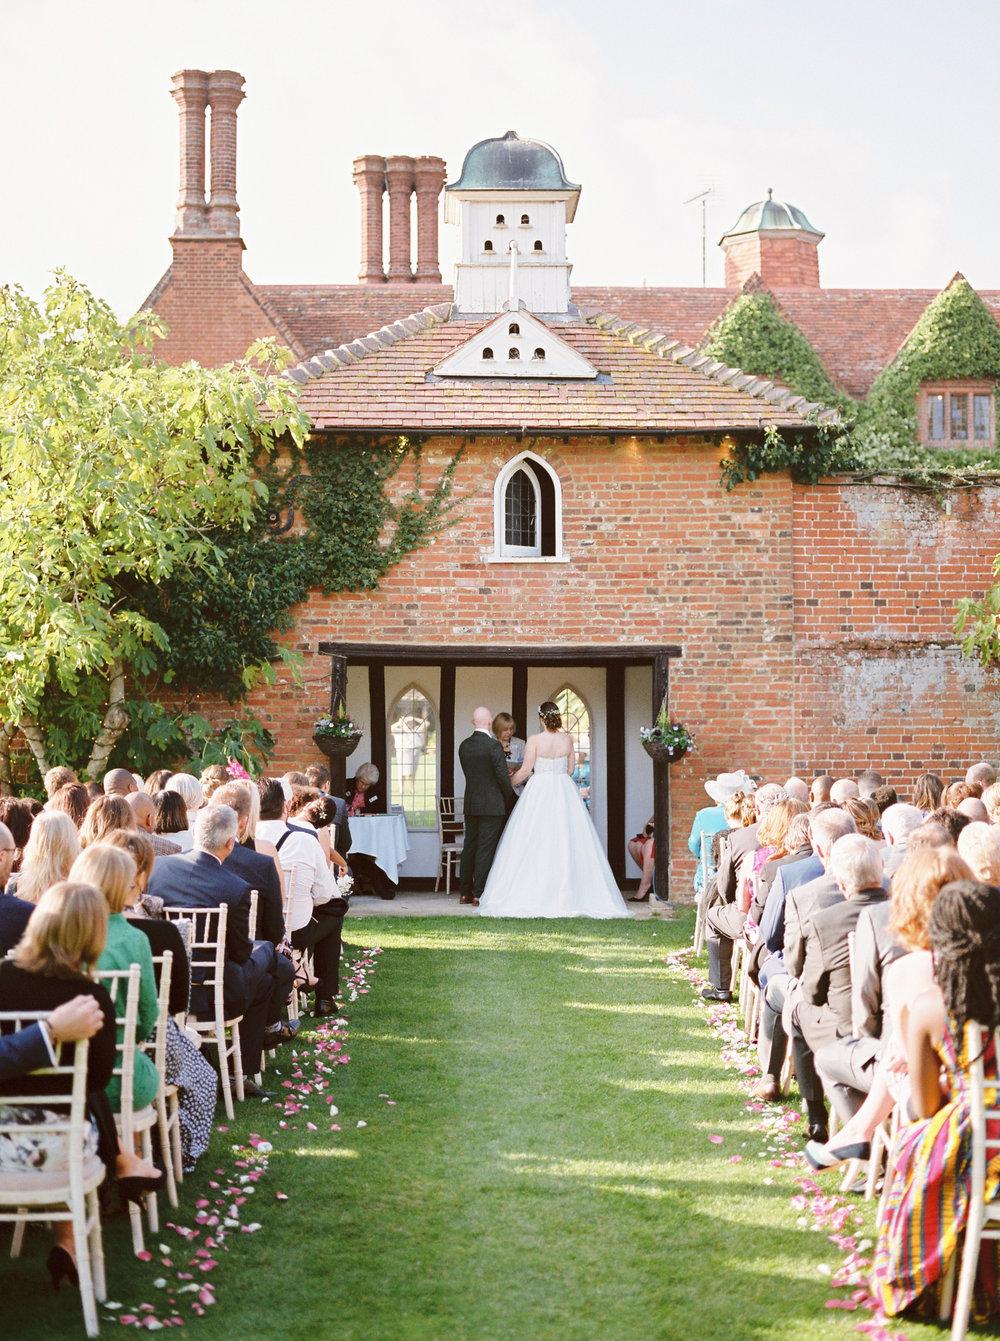 woodhall manor wedding ceremony